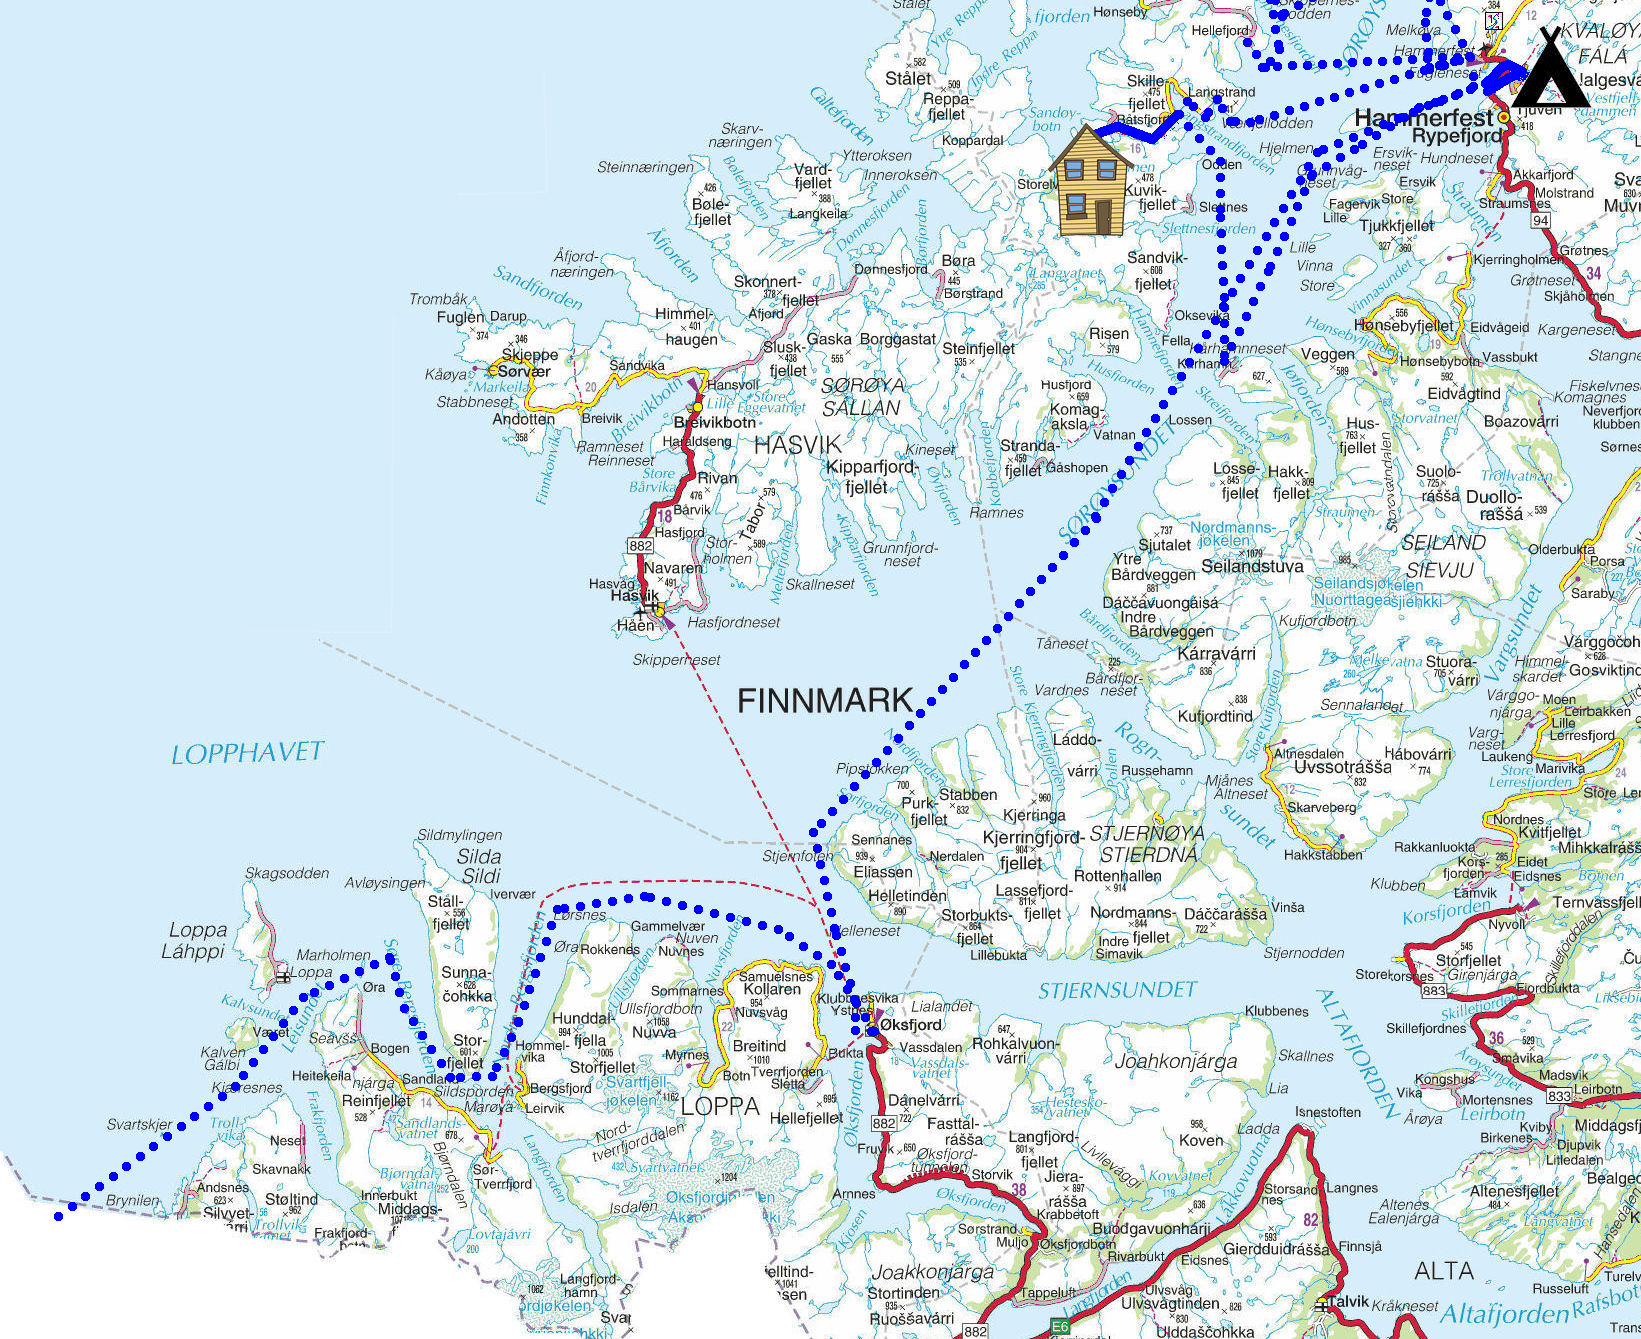 drangedal Hammerfest